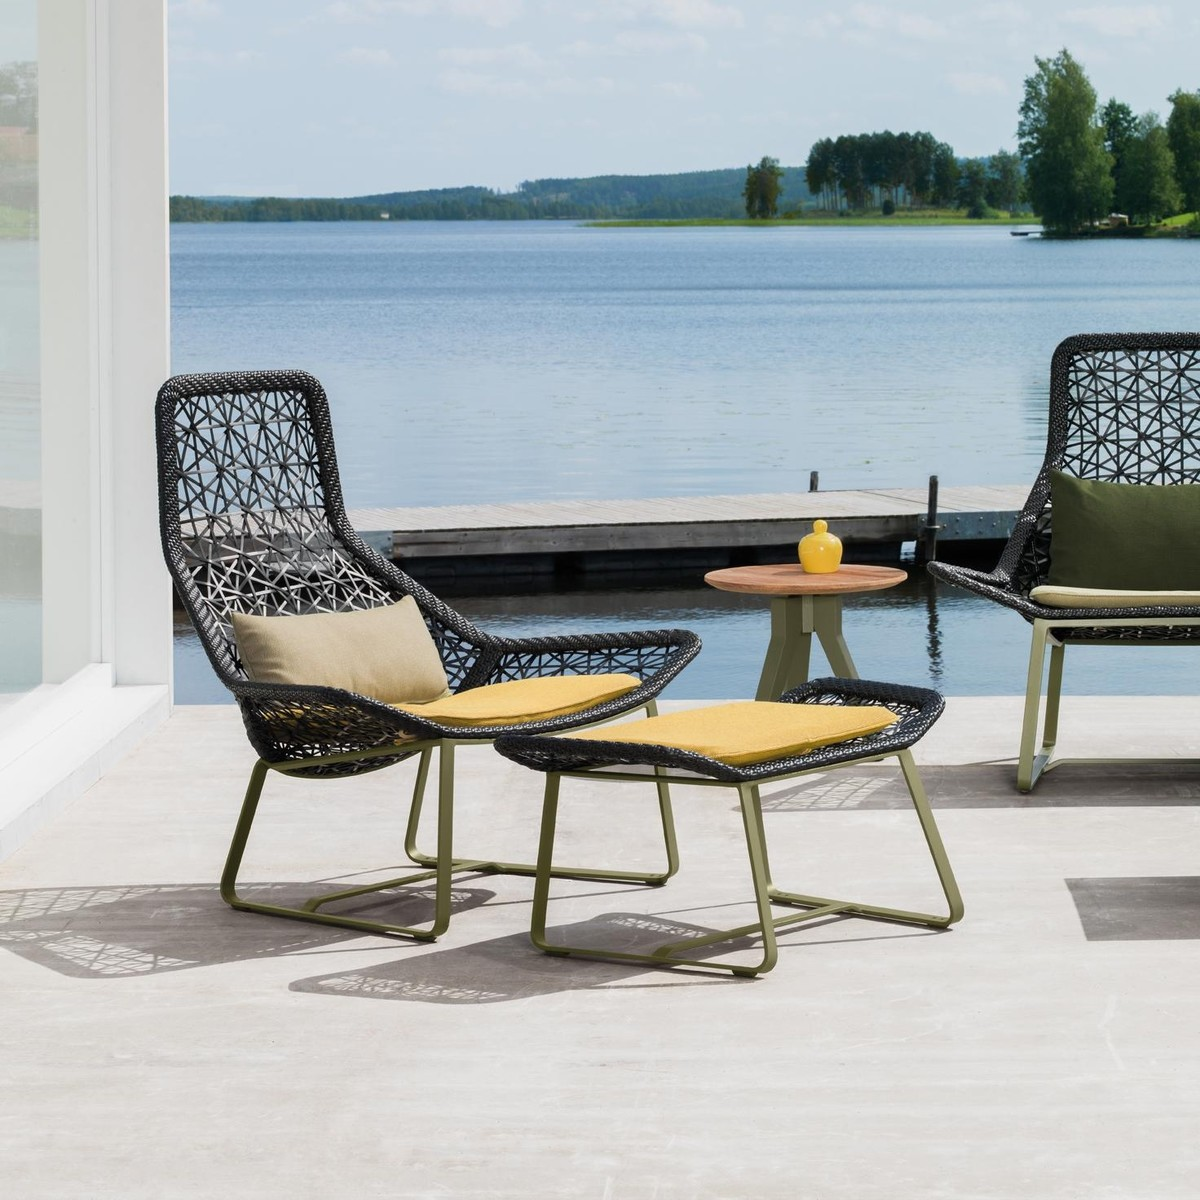 Maia Relax Armchair Garden Chair Kettal